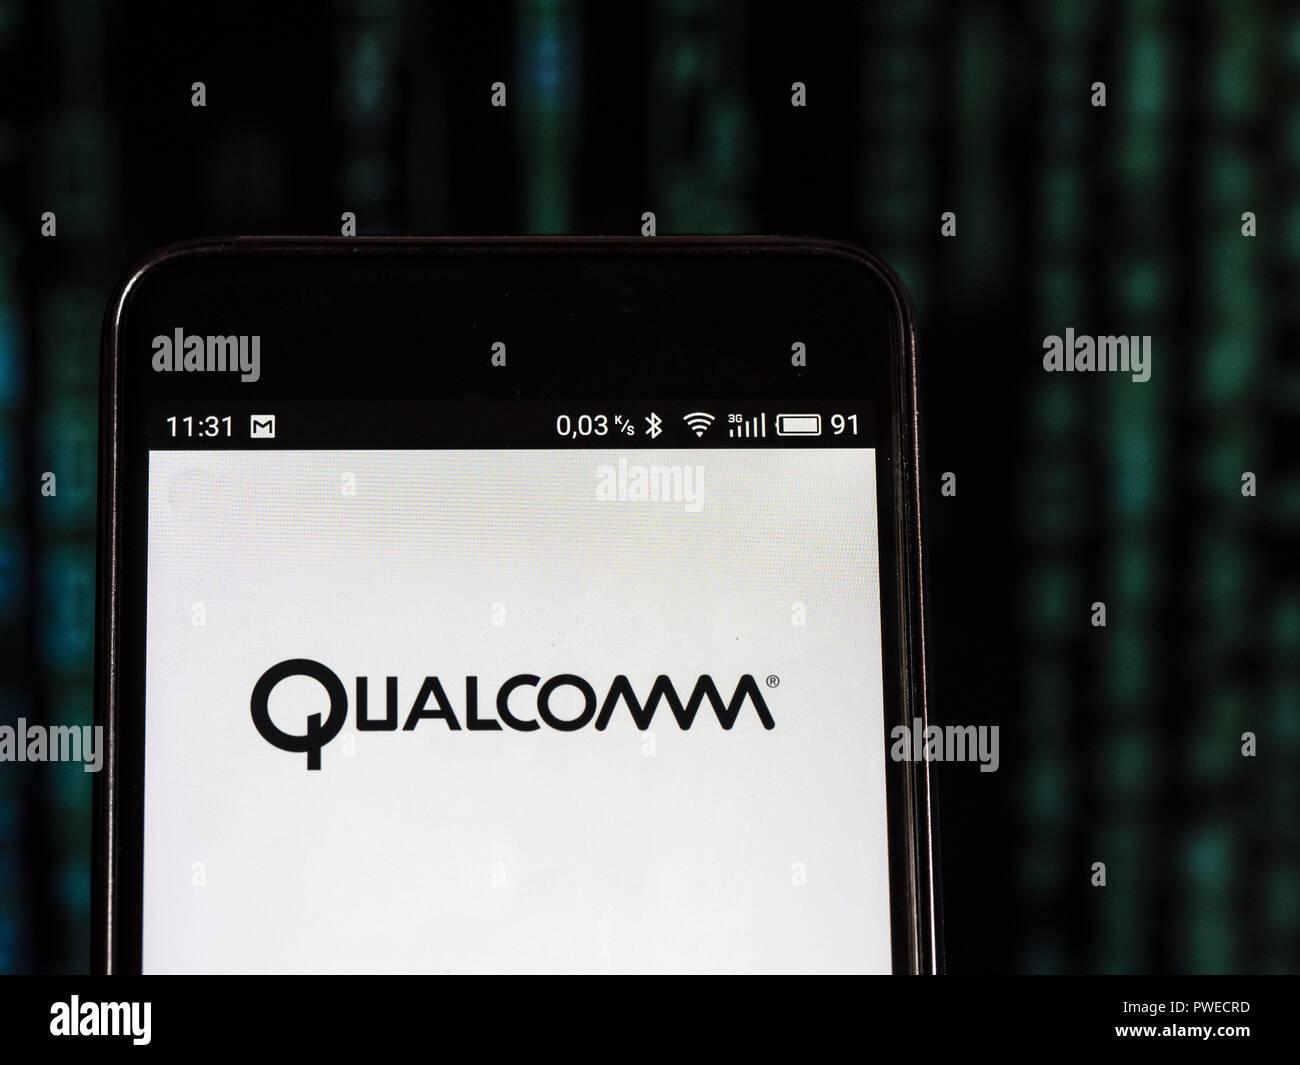 Qualcomm Logo Stock Photos & Qualcomm Logo Stock Images - Alamy